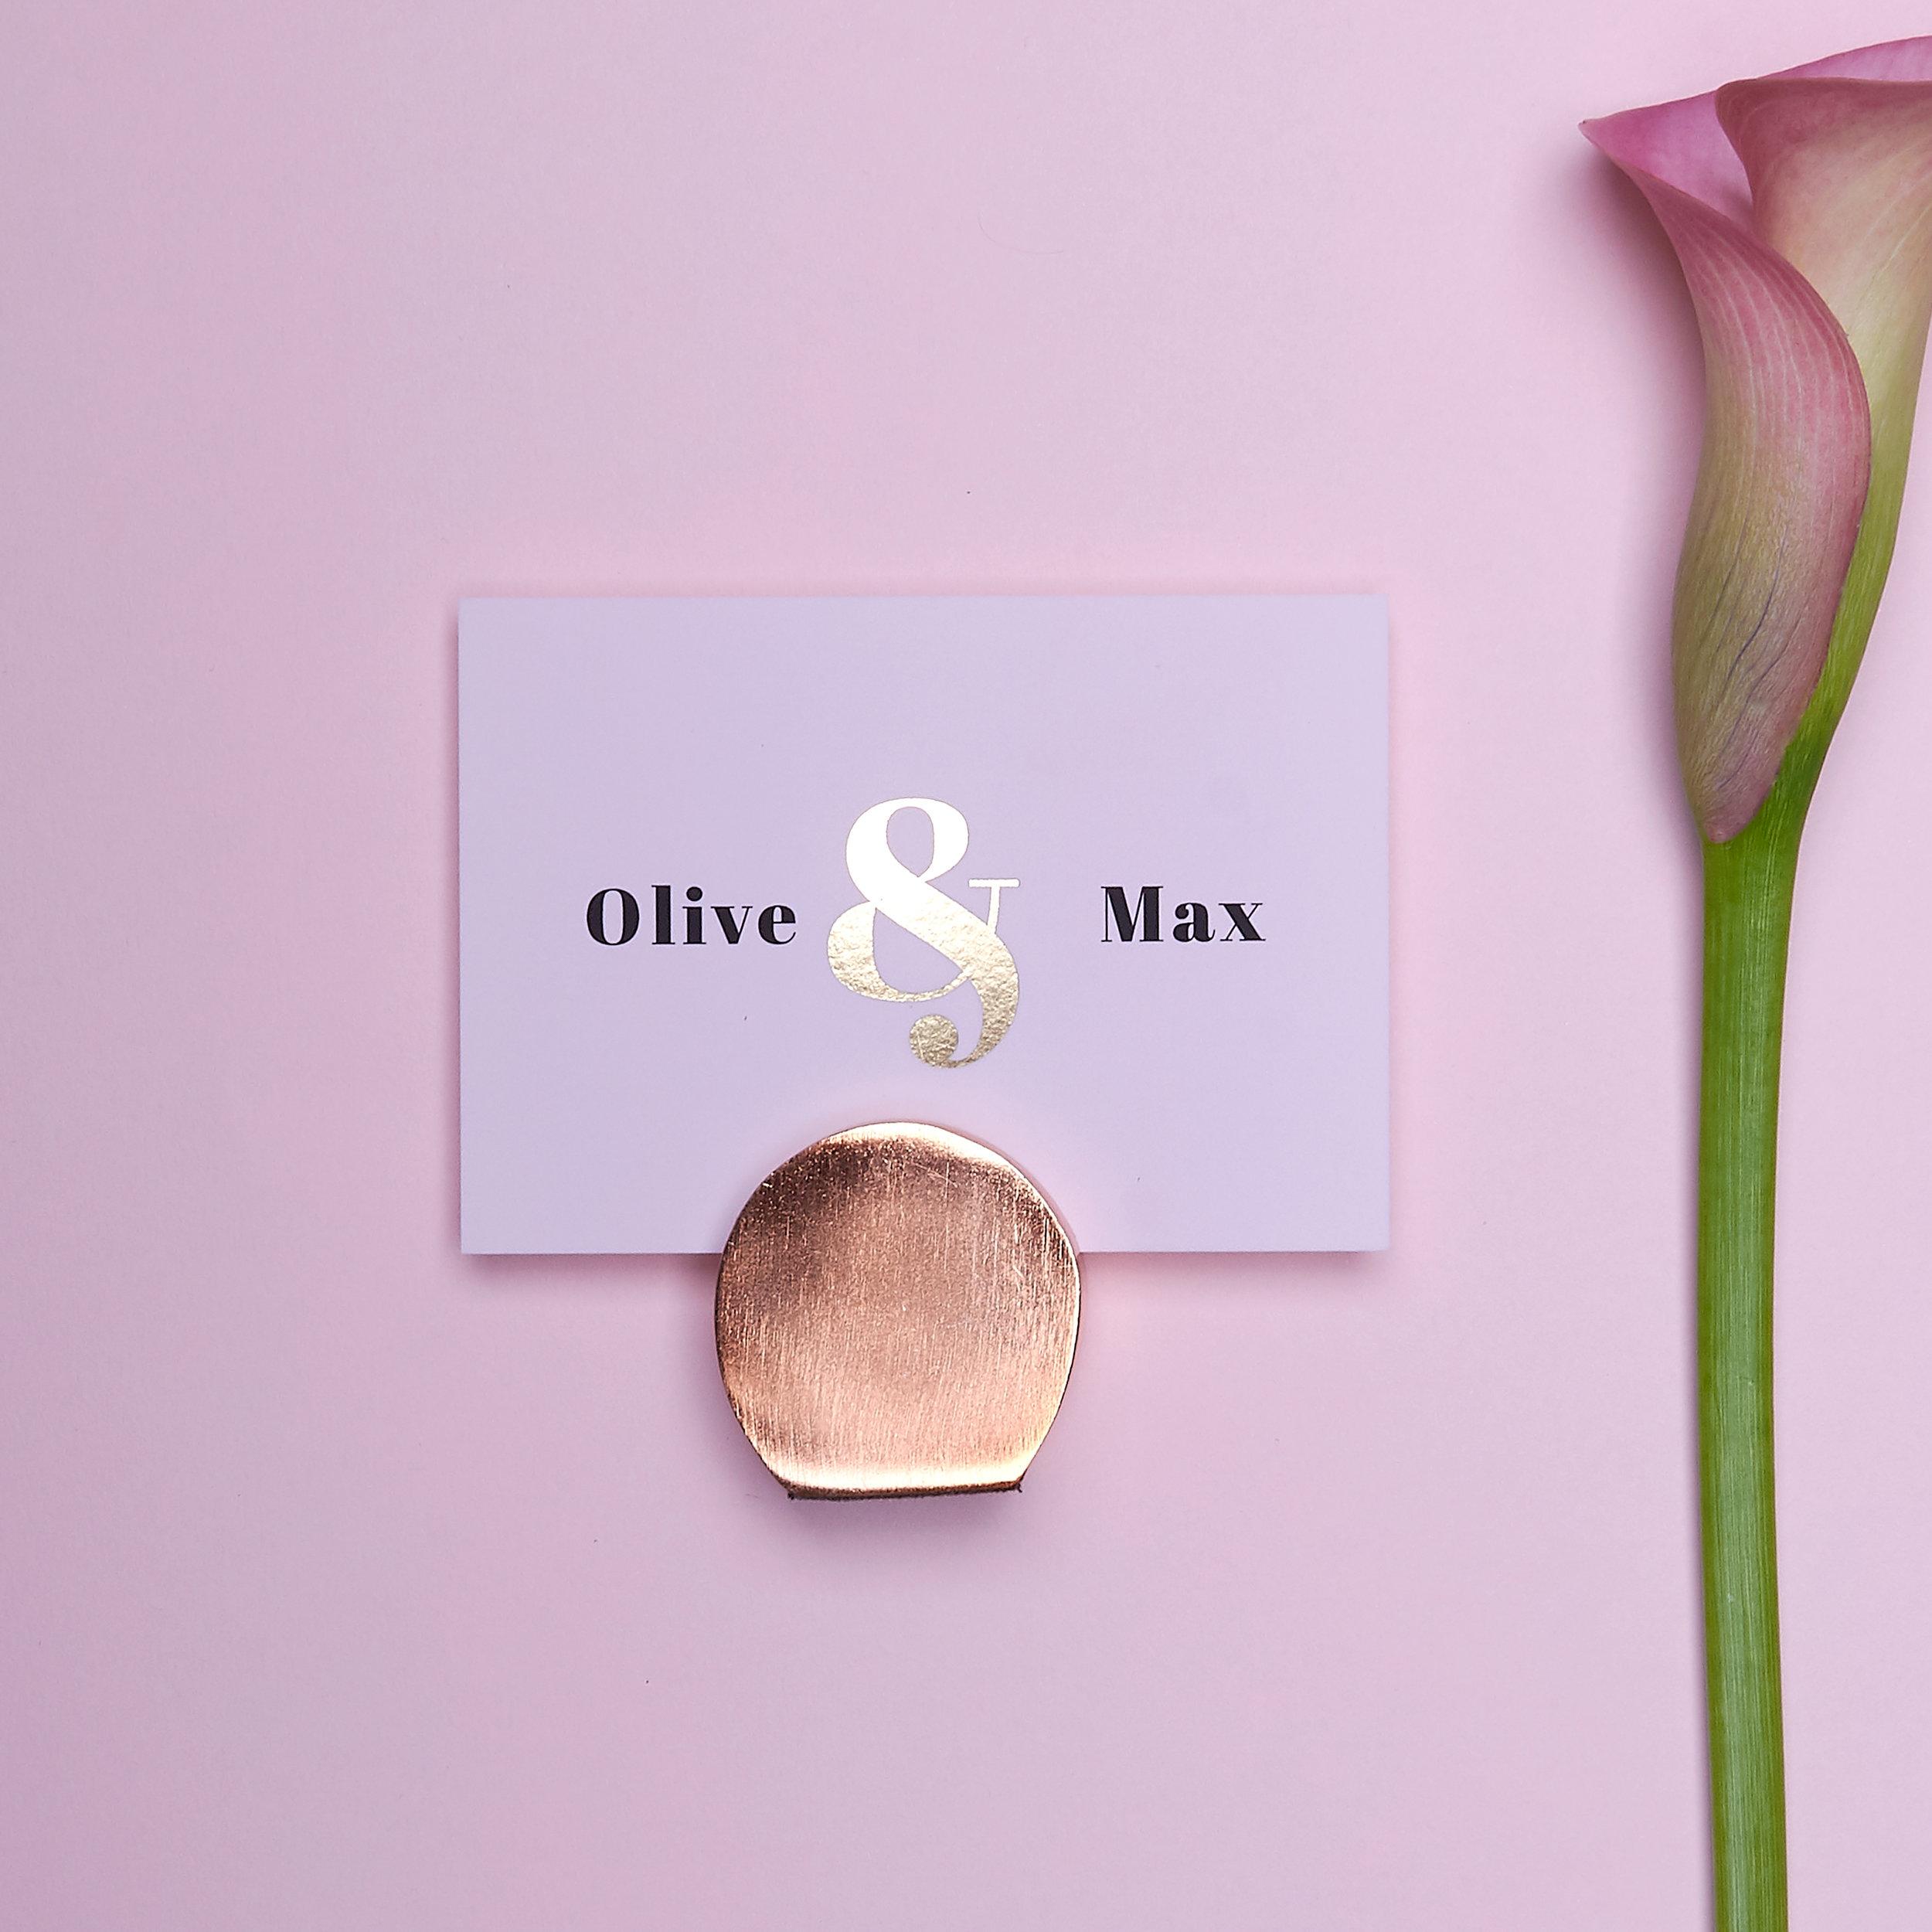 Olive_&_Max_8.jpg